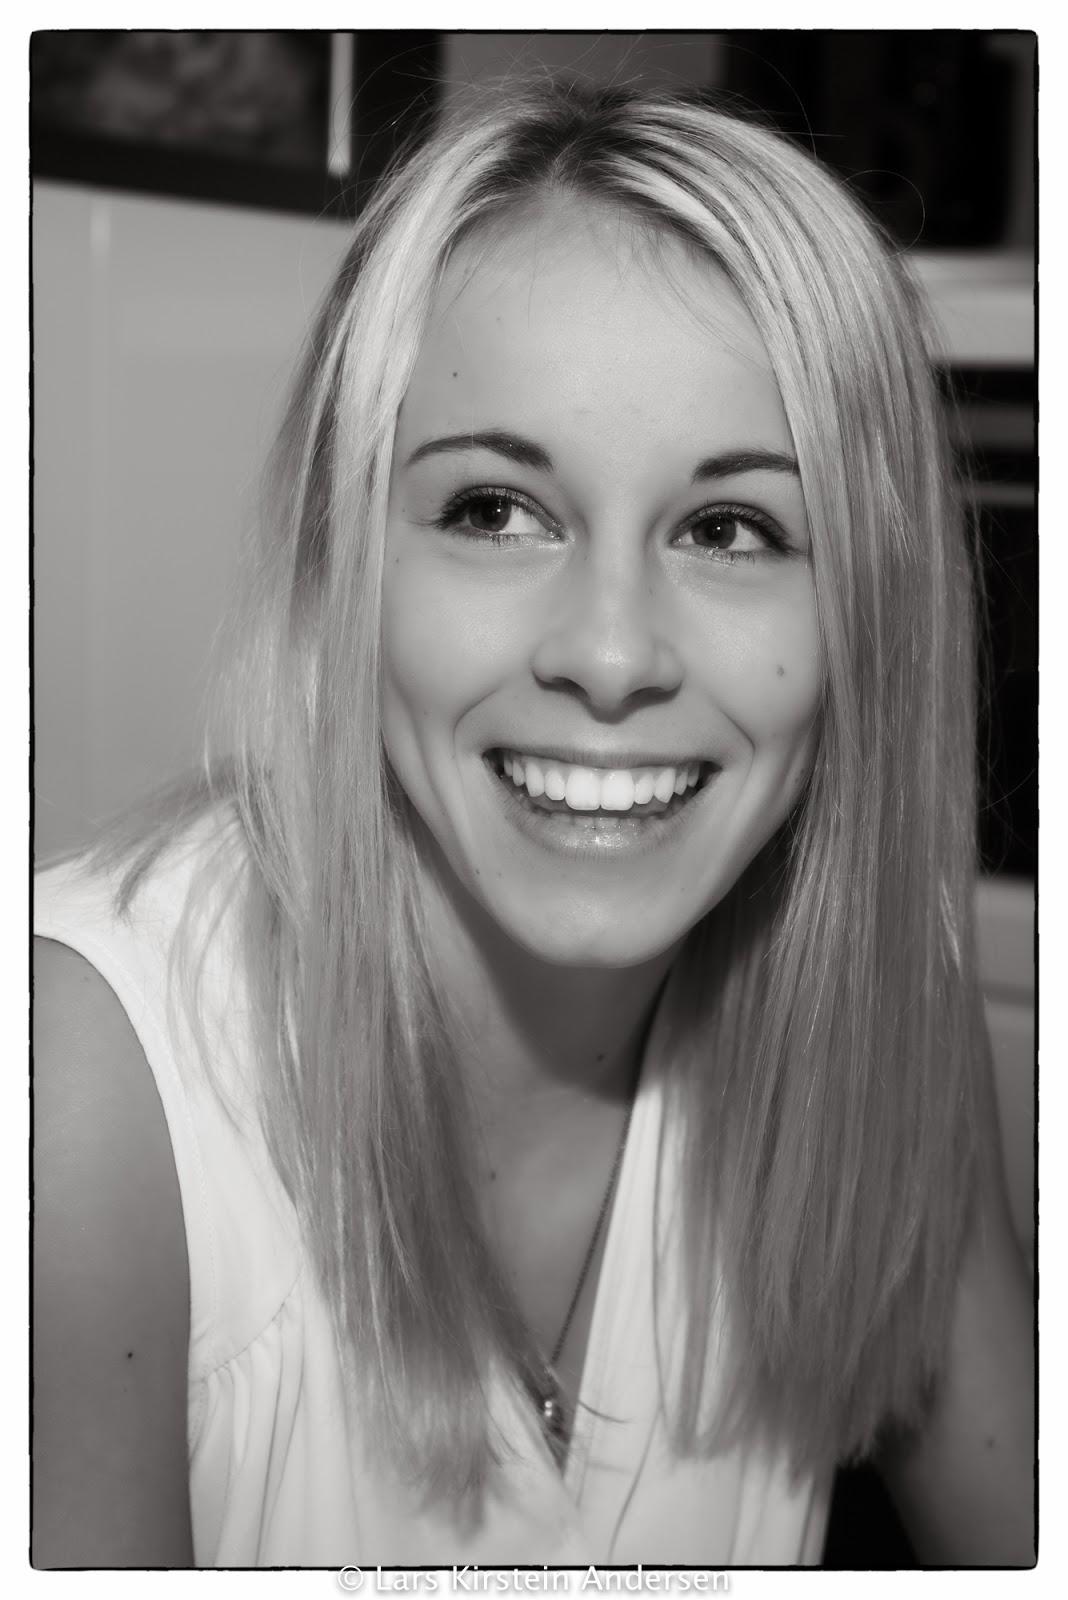 Mia Blichfeldt